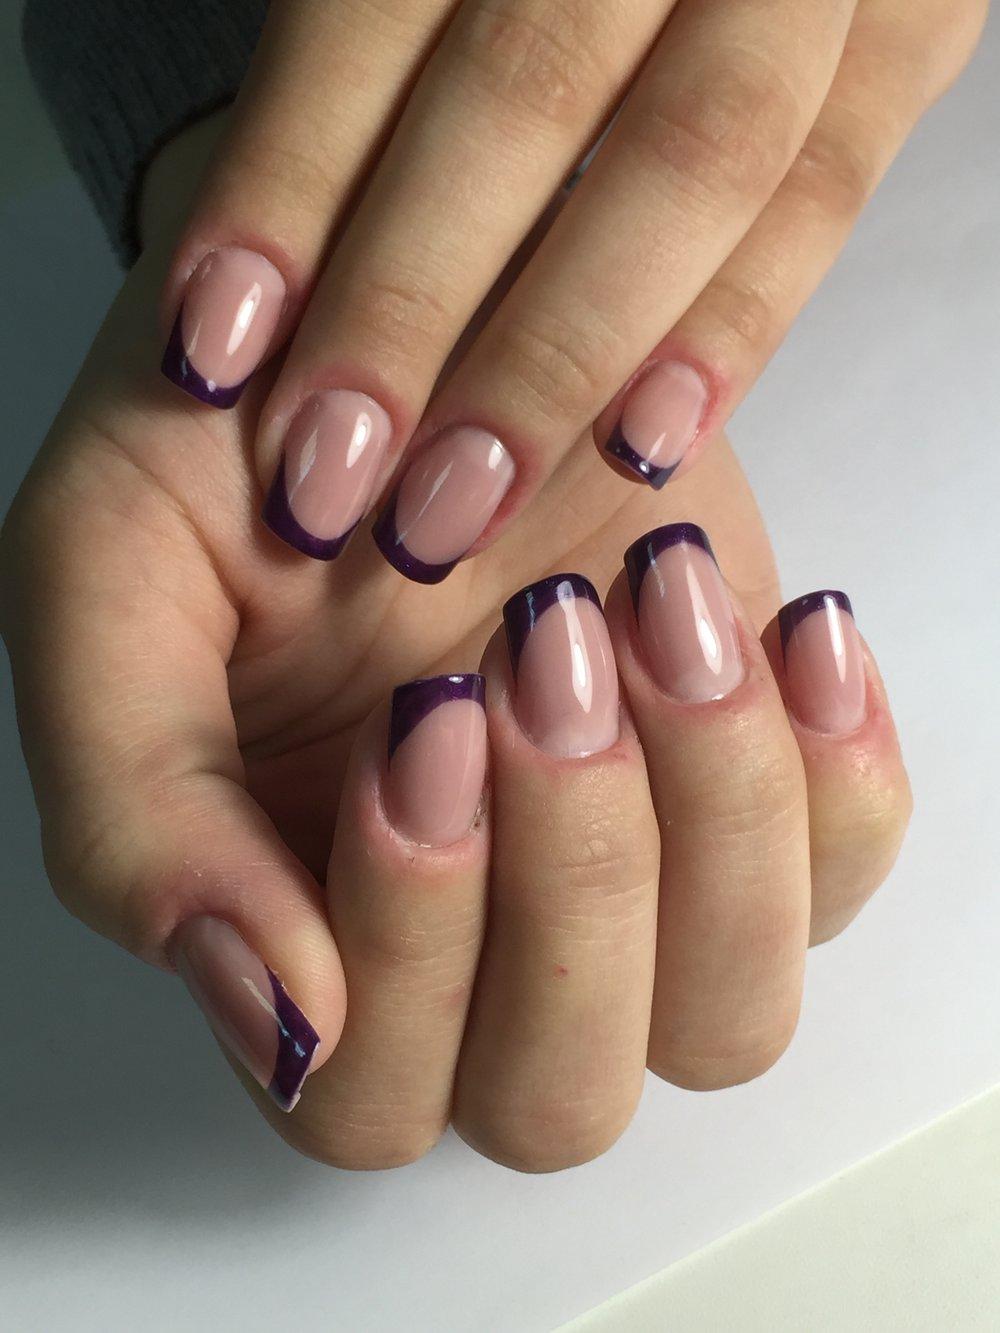 Acrylic Gel PolyGel Nails In Brighton Nail Biting Skin Picking